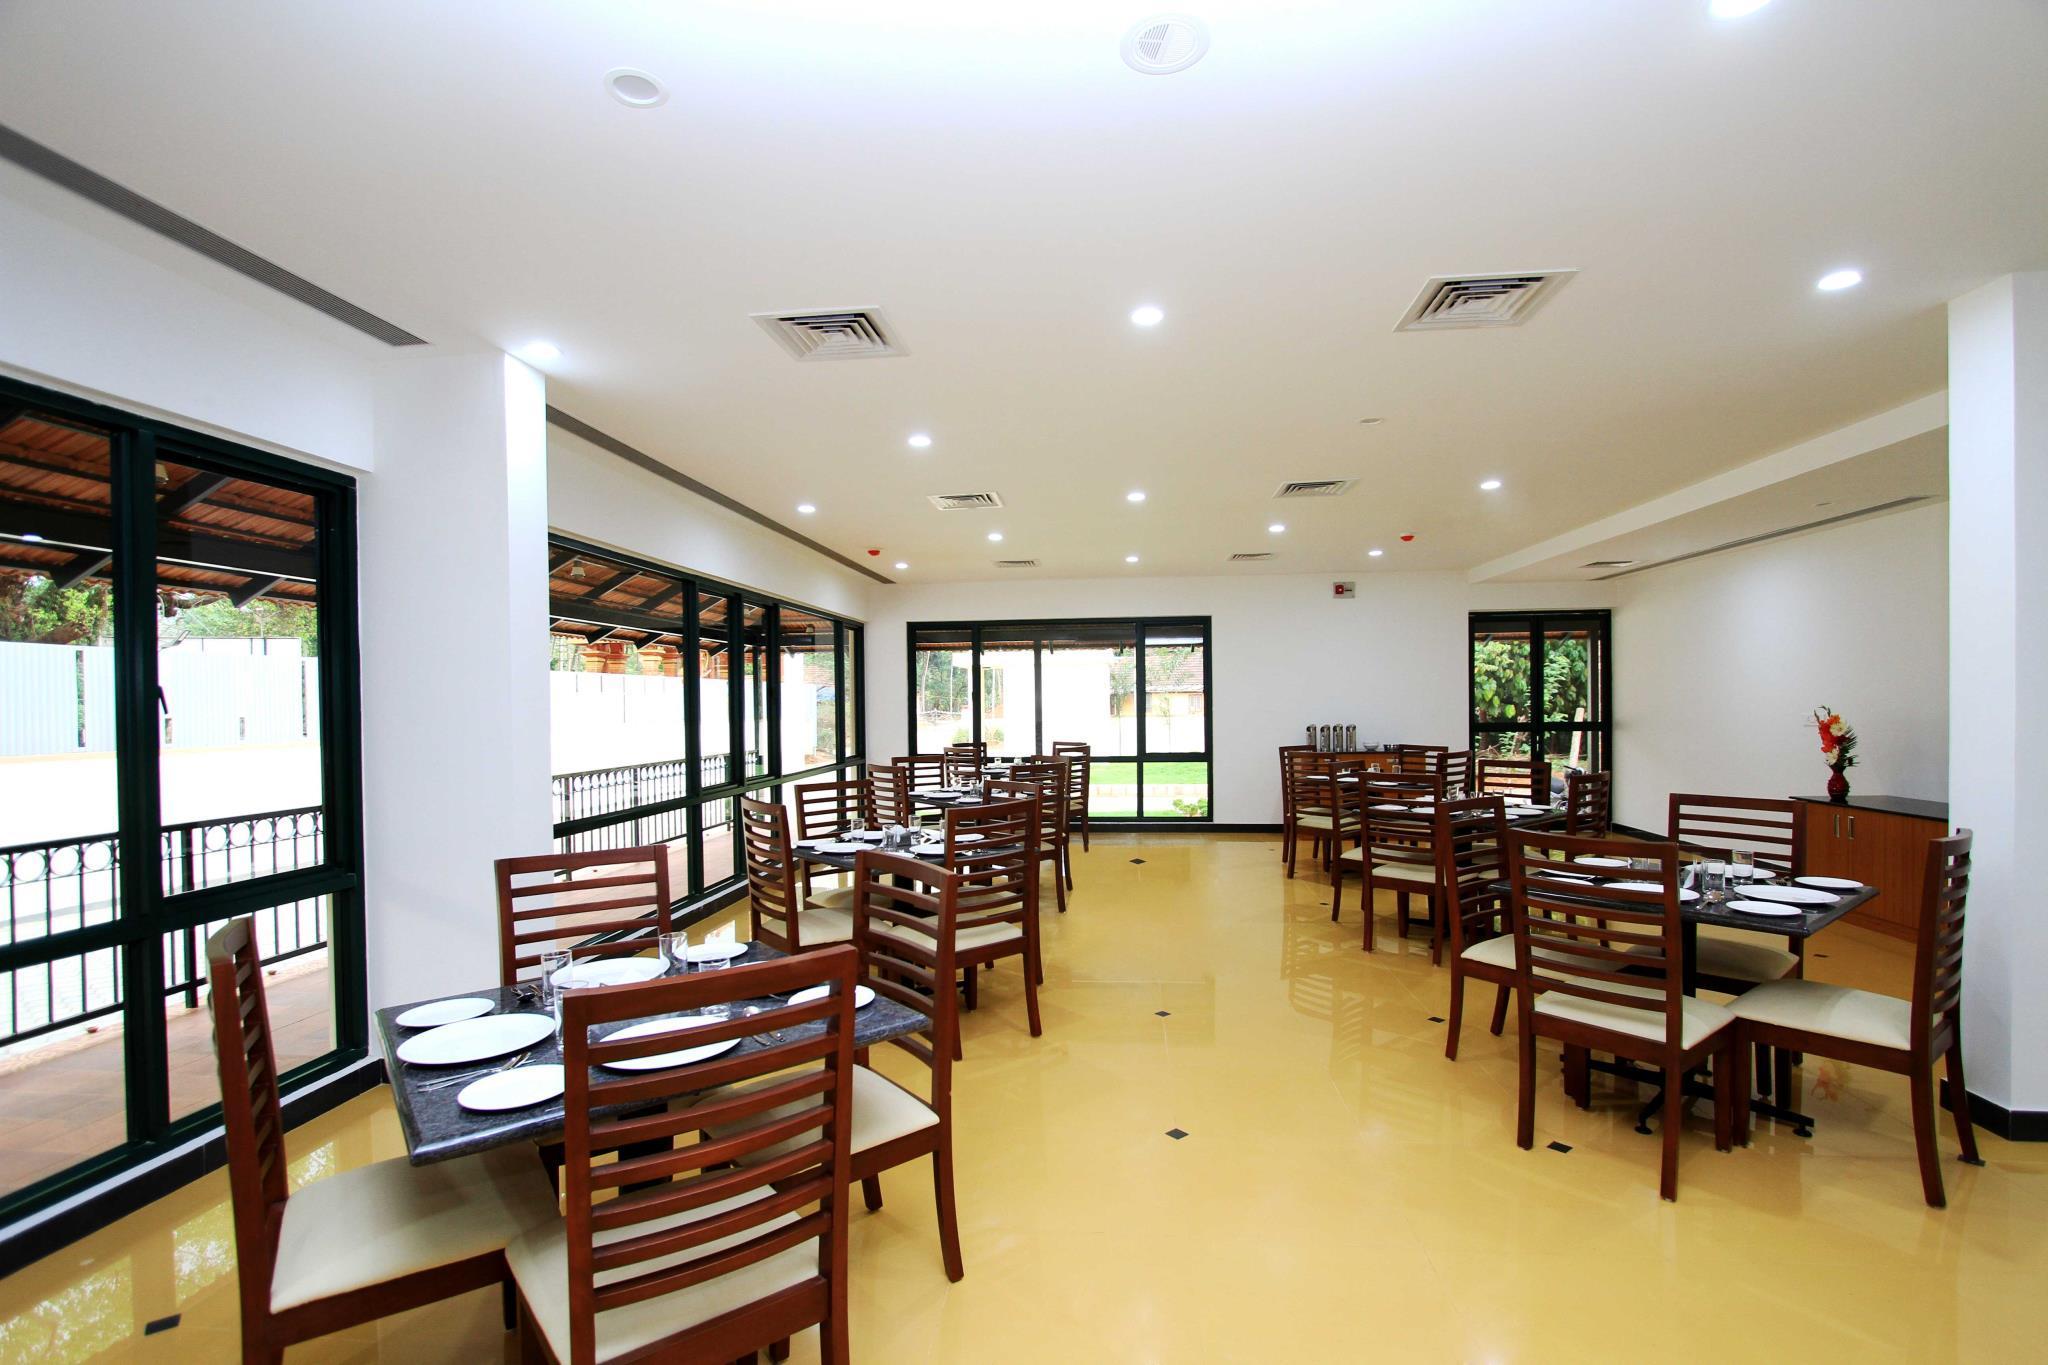 Price Hotel Dwara, Kukke Subrahmanya